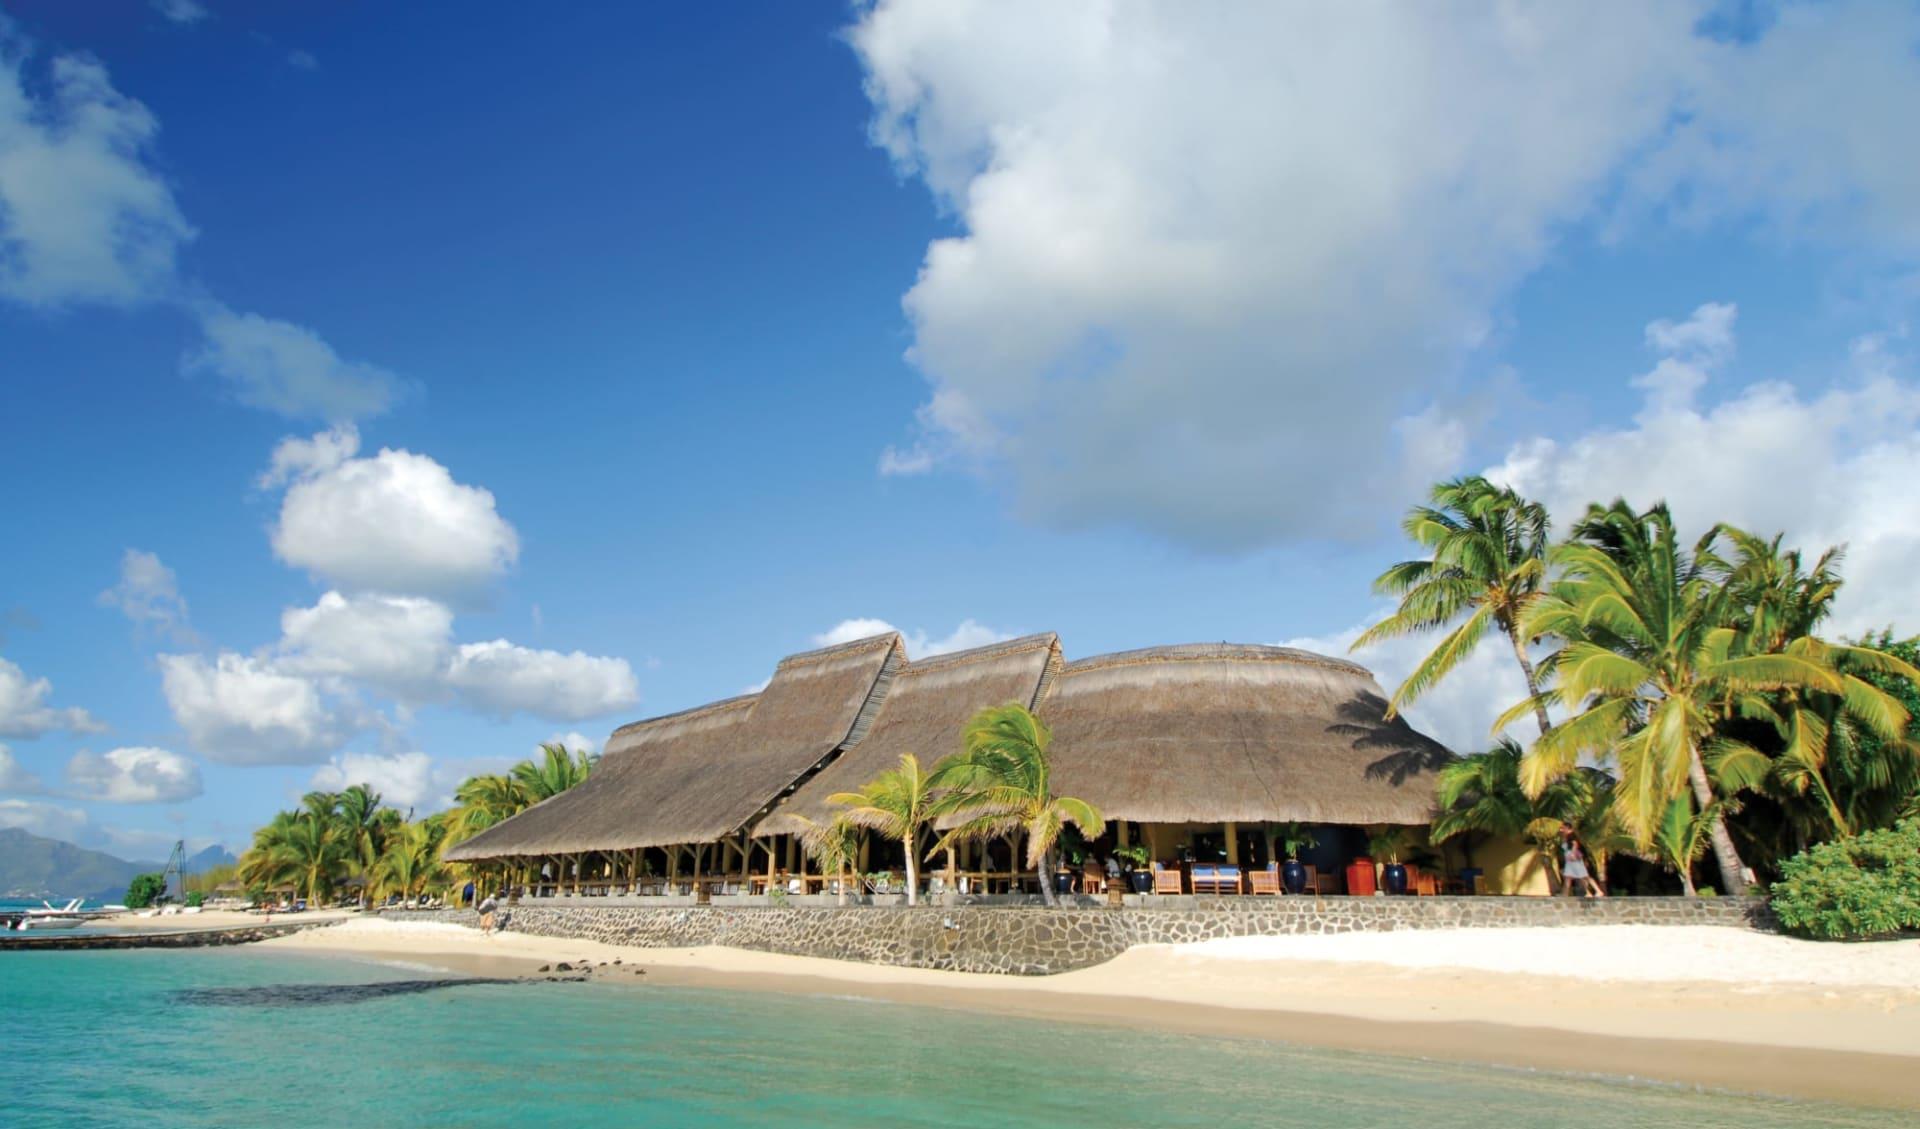 Paradis Beachcomber Golf Resort & Spa in Le Morne:  Beachcomber Paradis Hotel & Golf Club - Haupthaus